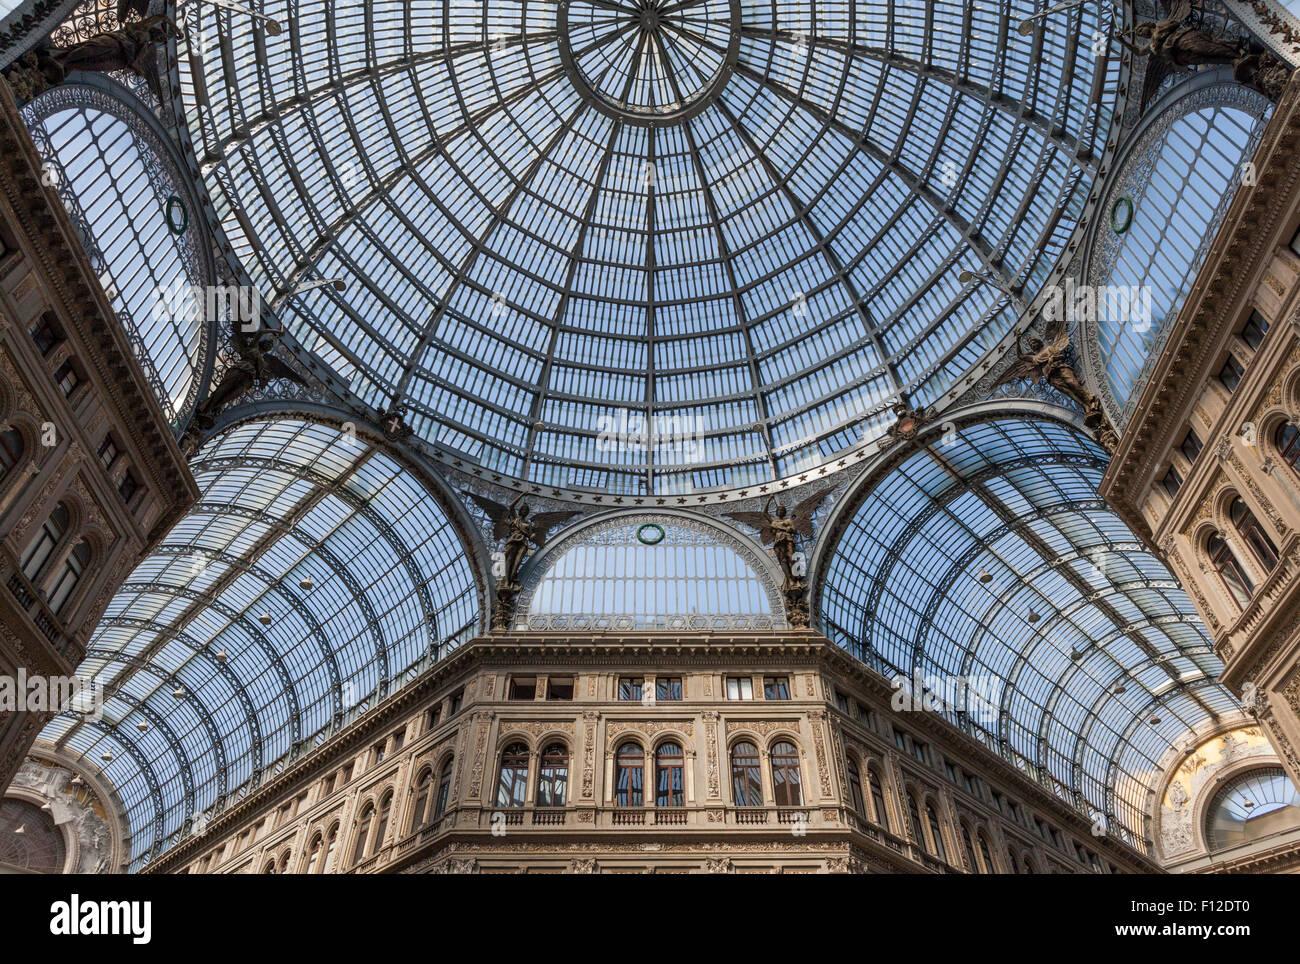 Glas-Kuppel und Gewölbe der Galleria Umberto i. in Neapel, Italien Stockbild